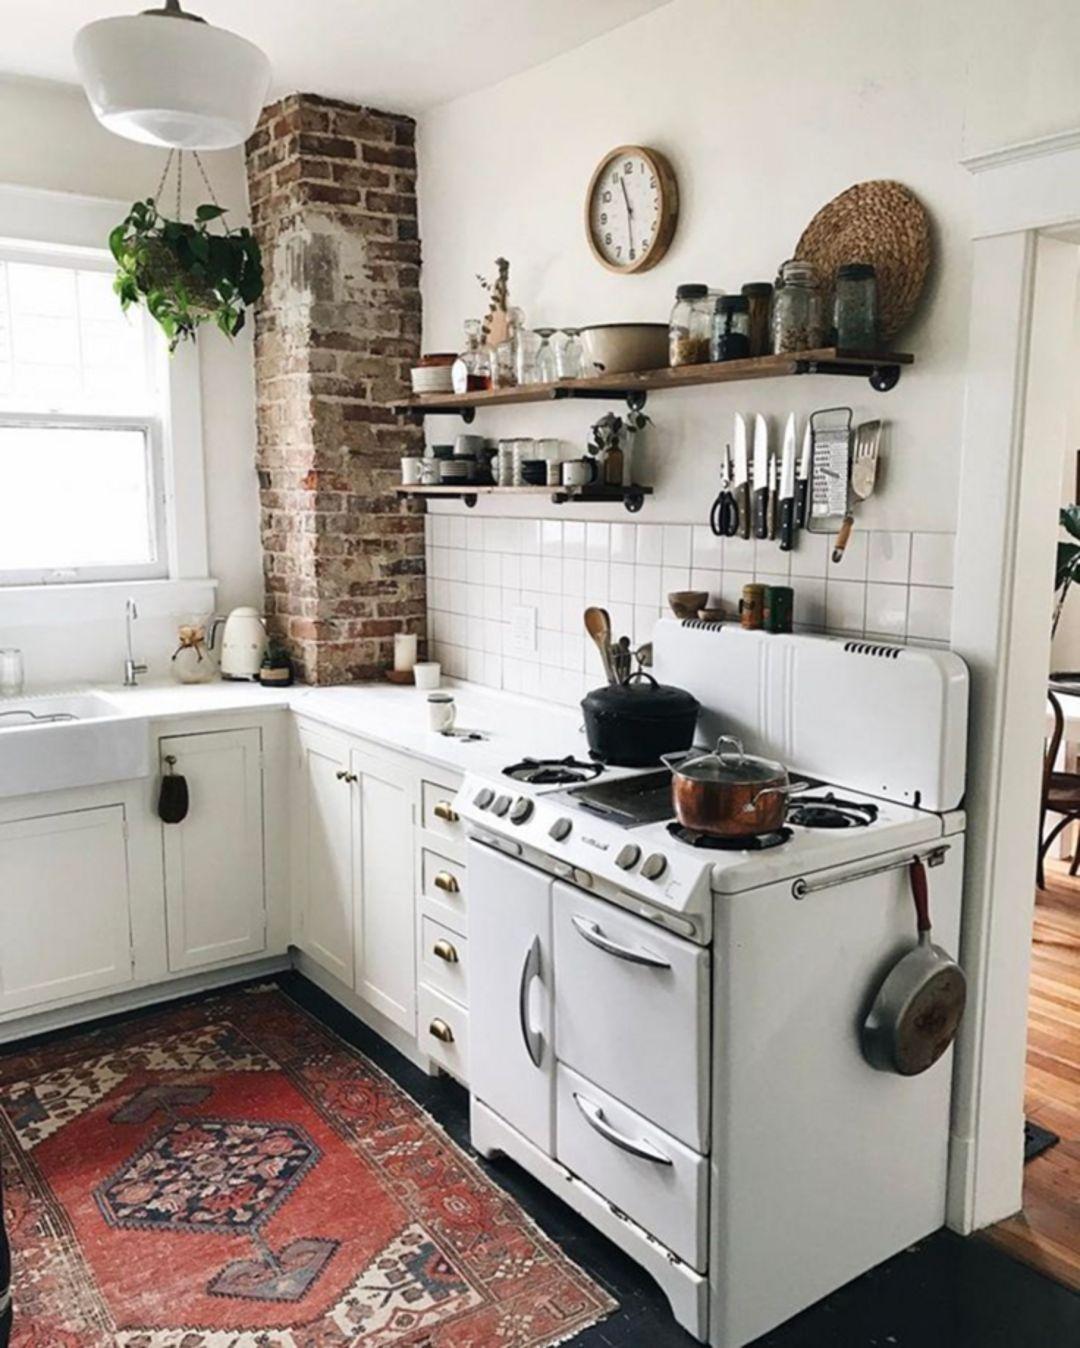 Interesting 25 Minimalist Kitchen Self Design Ideas To Make Your Kitchen More Awesome Kitchen Design Small Tiny House Kitchen Home Decor Kitchen